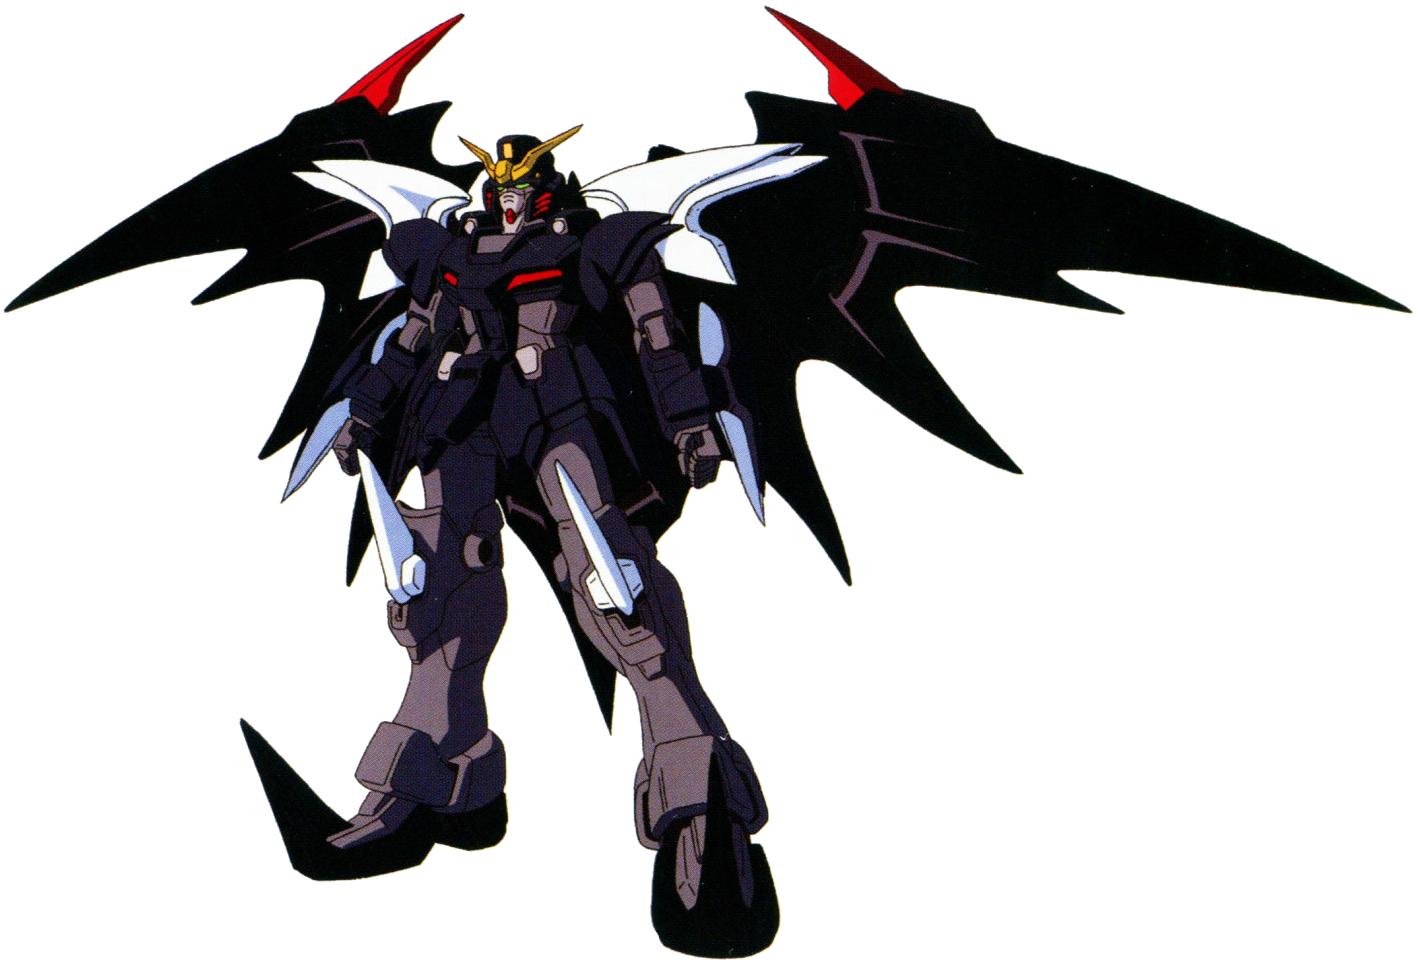 File:Gundam Deathscythe Hell CustomW0.jpg